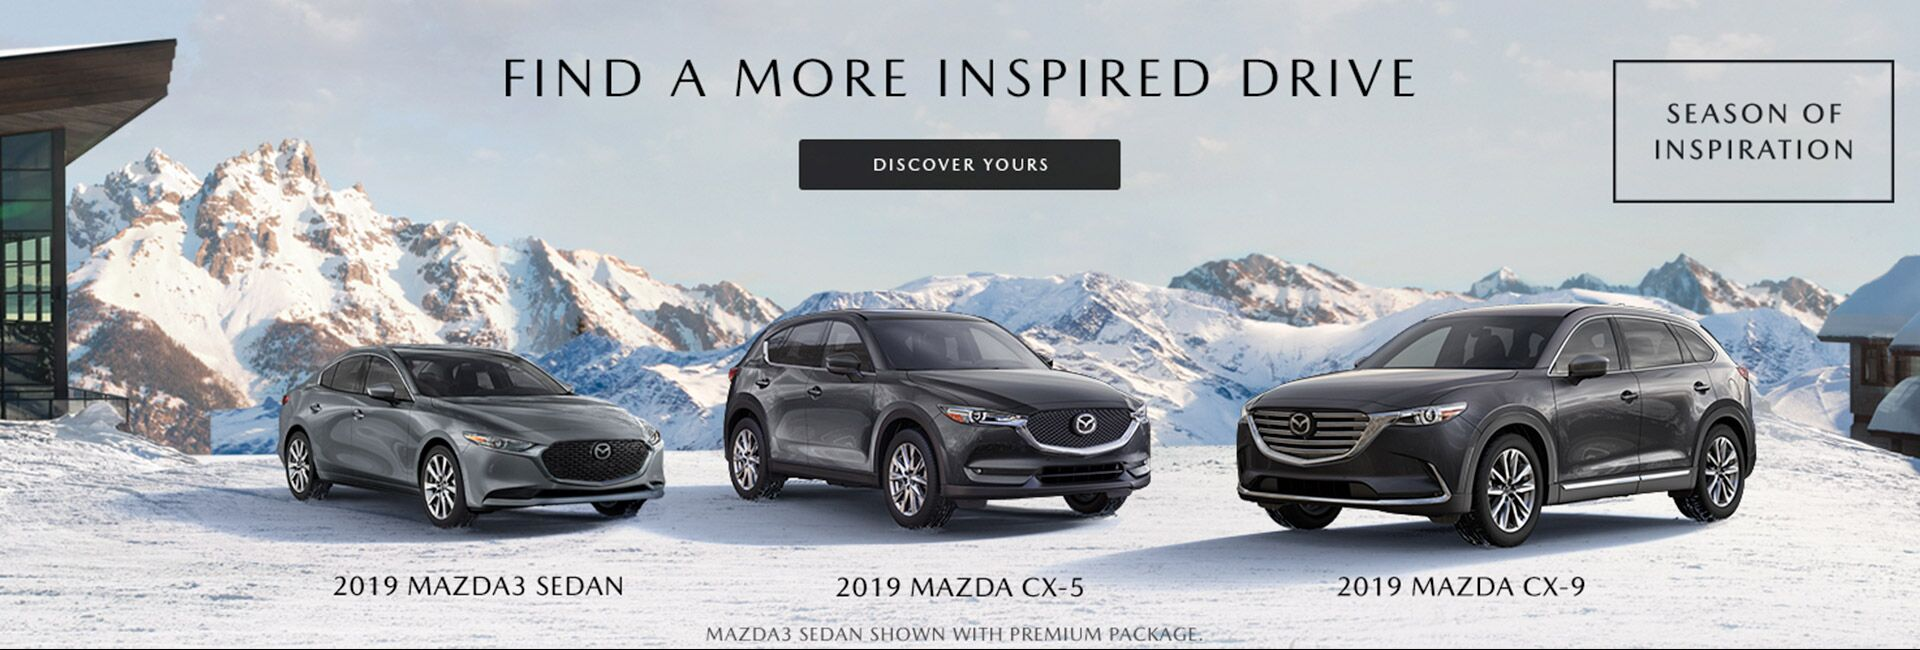 Indiana Pa Car Dealerships >> Mazda Dealership Indiana Pa Pre Owned Cars Colonial Mazda